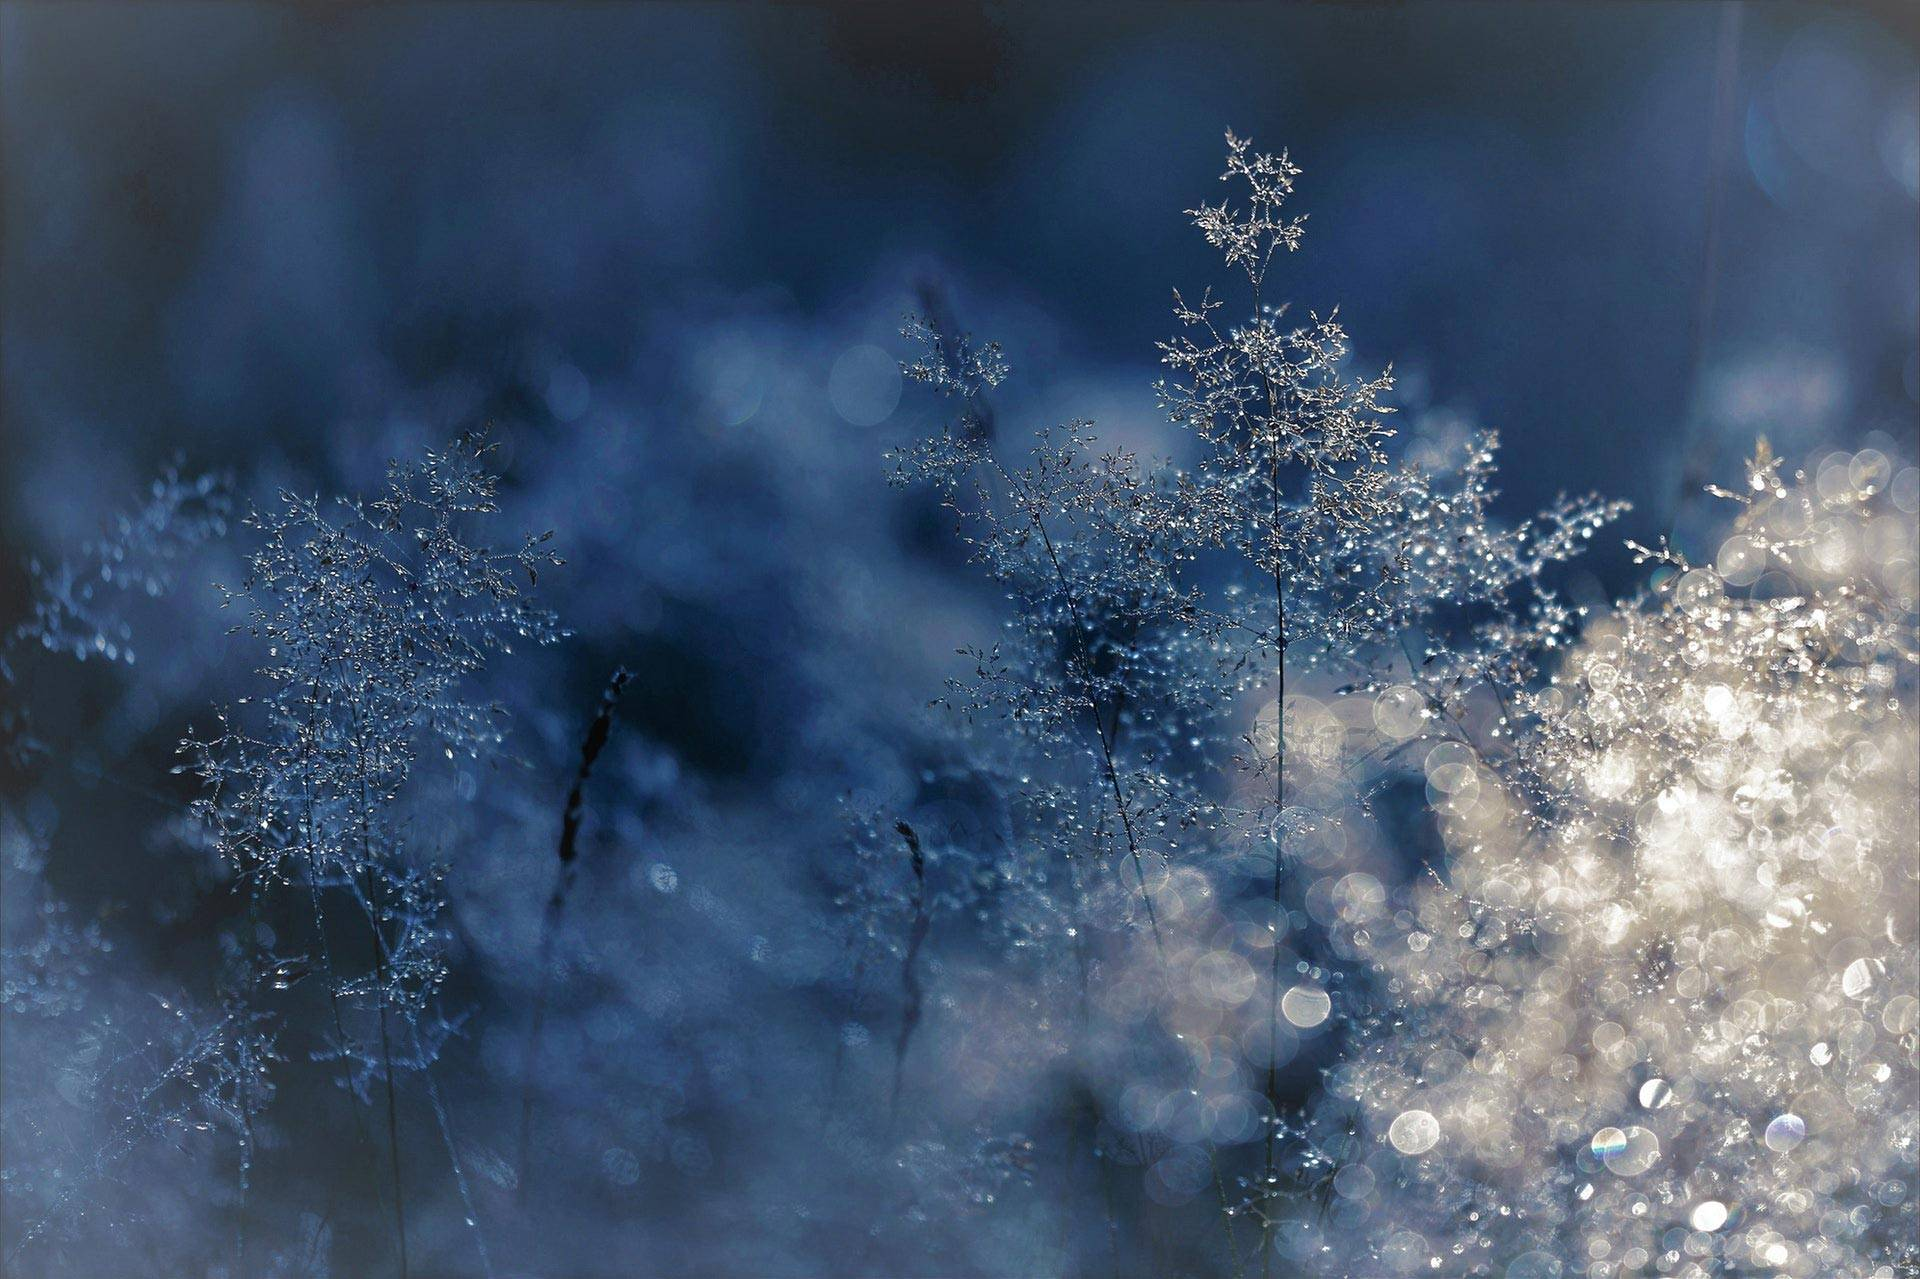 Energie de l'hiver